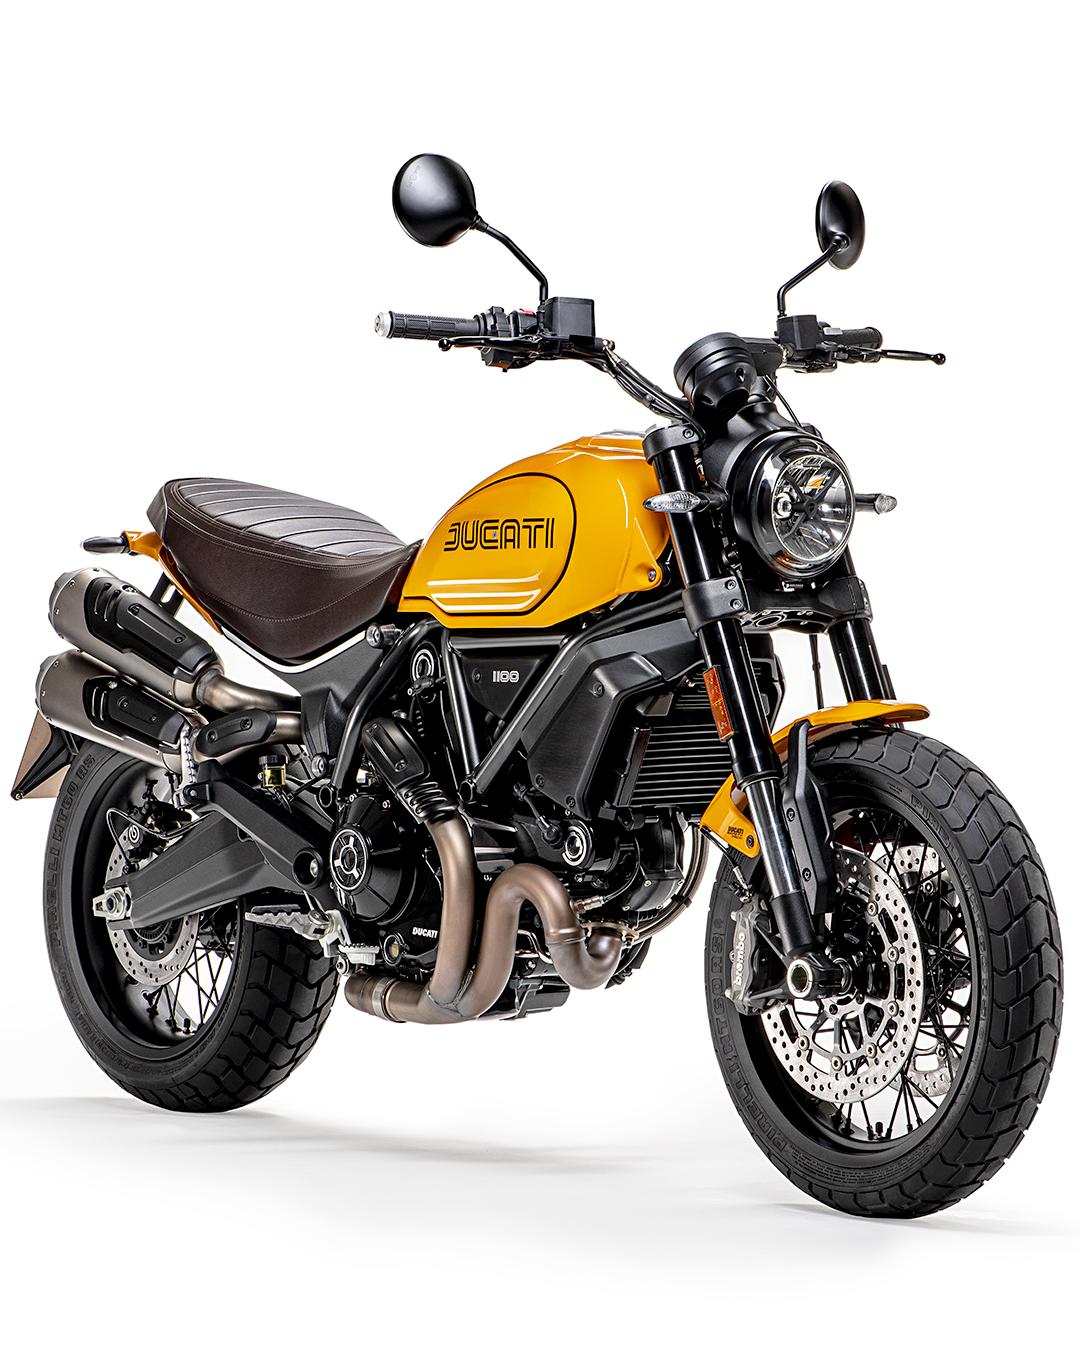 Ducati adds two new Scrambler models